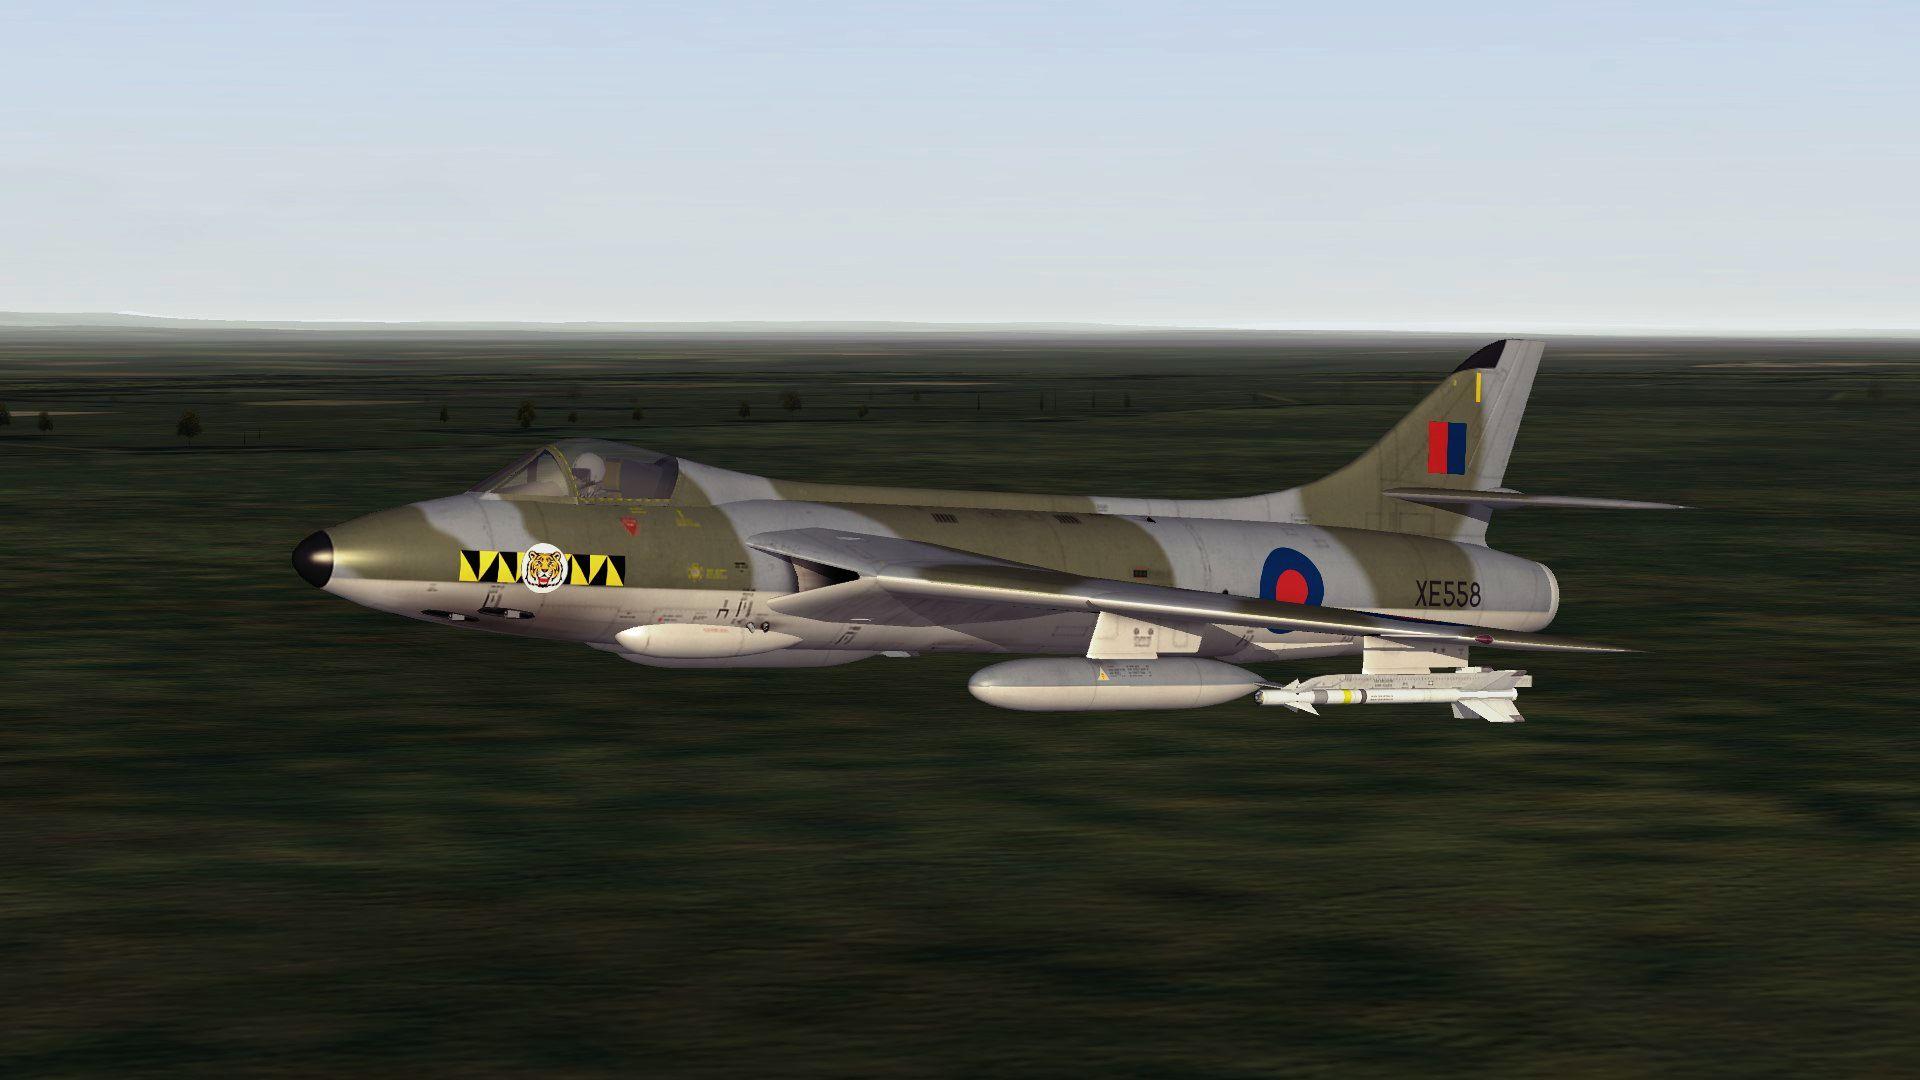 RAF%20HUNTER%20F6B.02_zpswnf6aui3.jpg